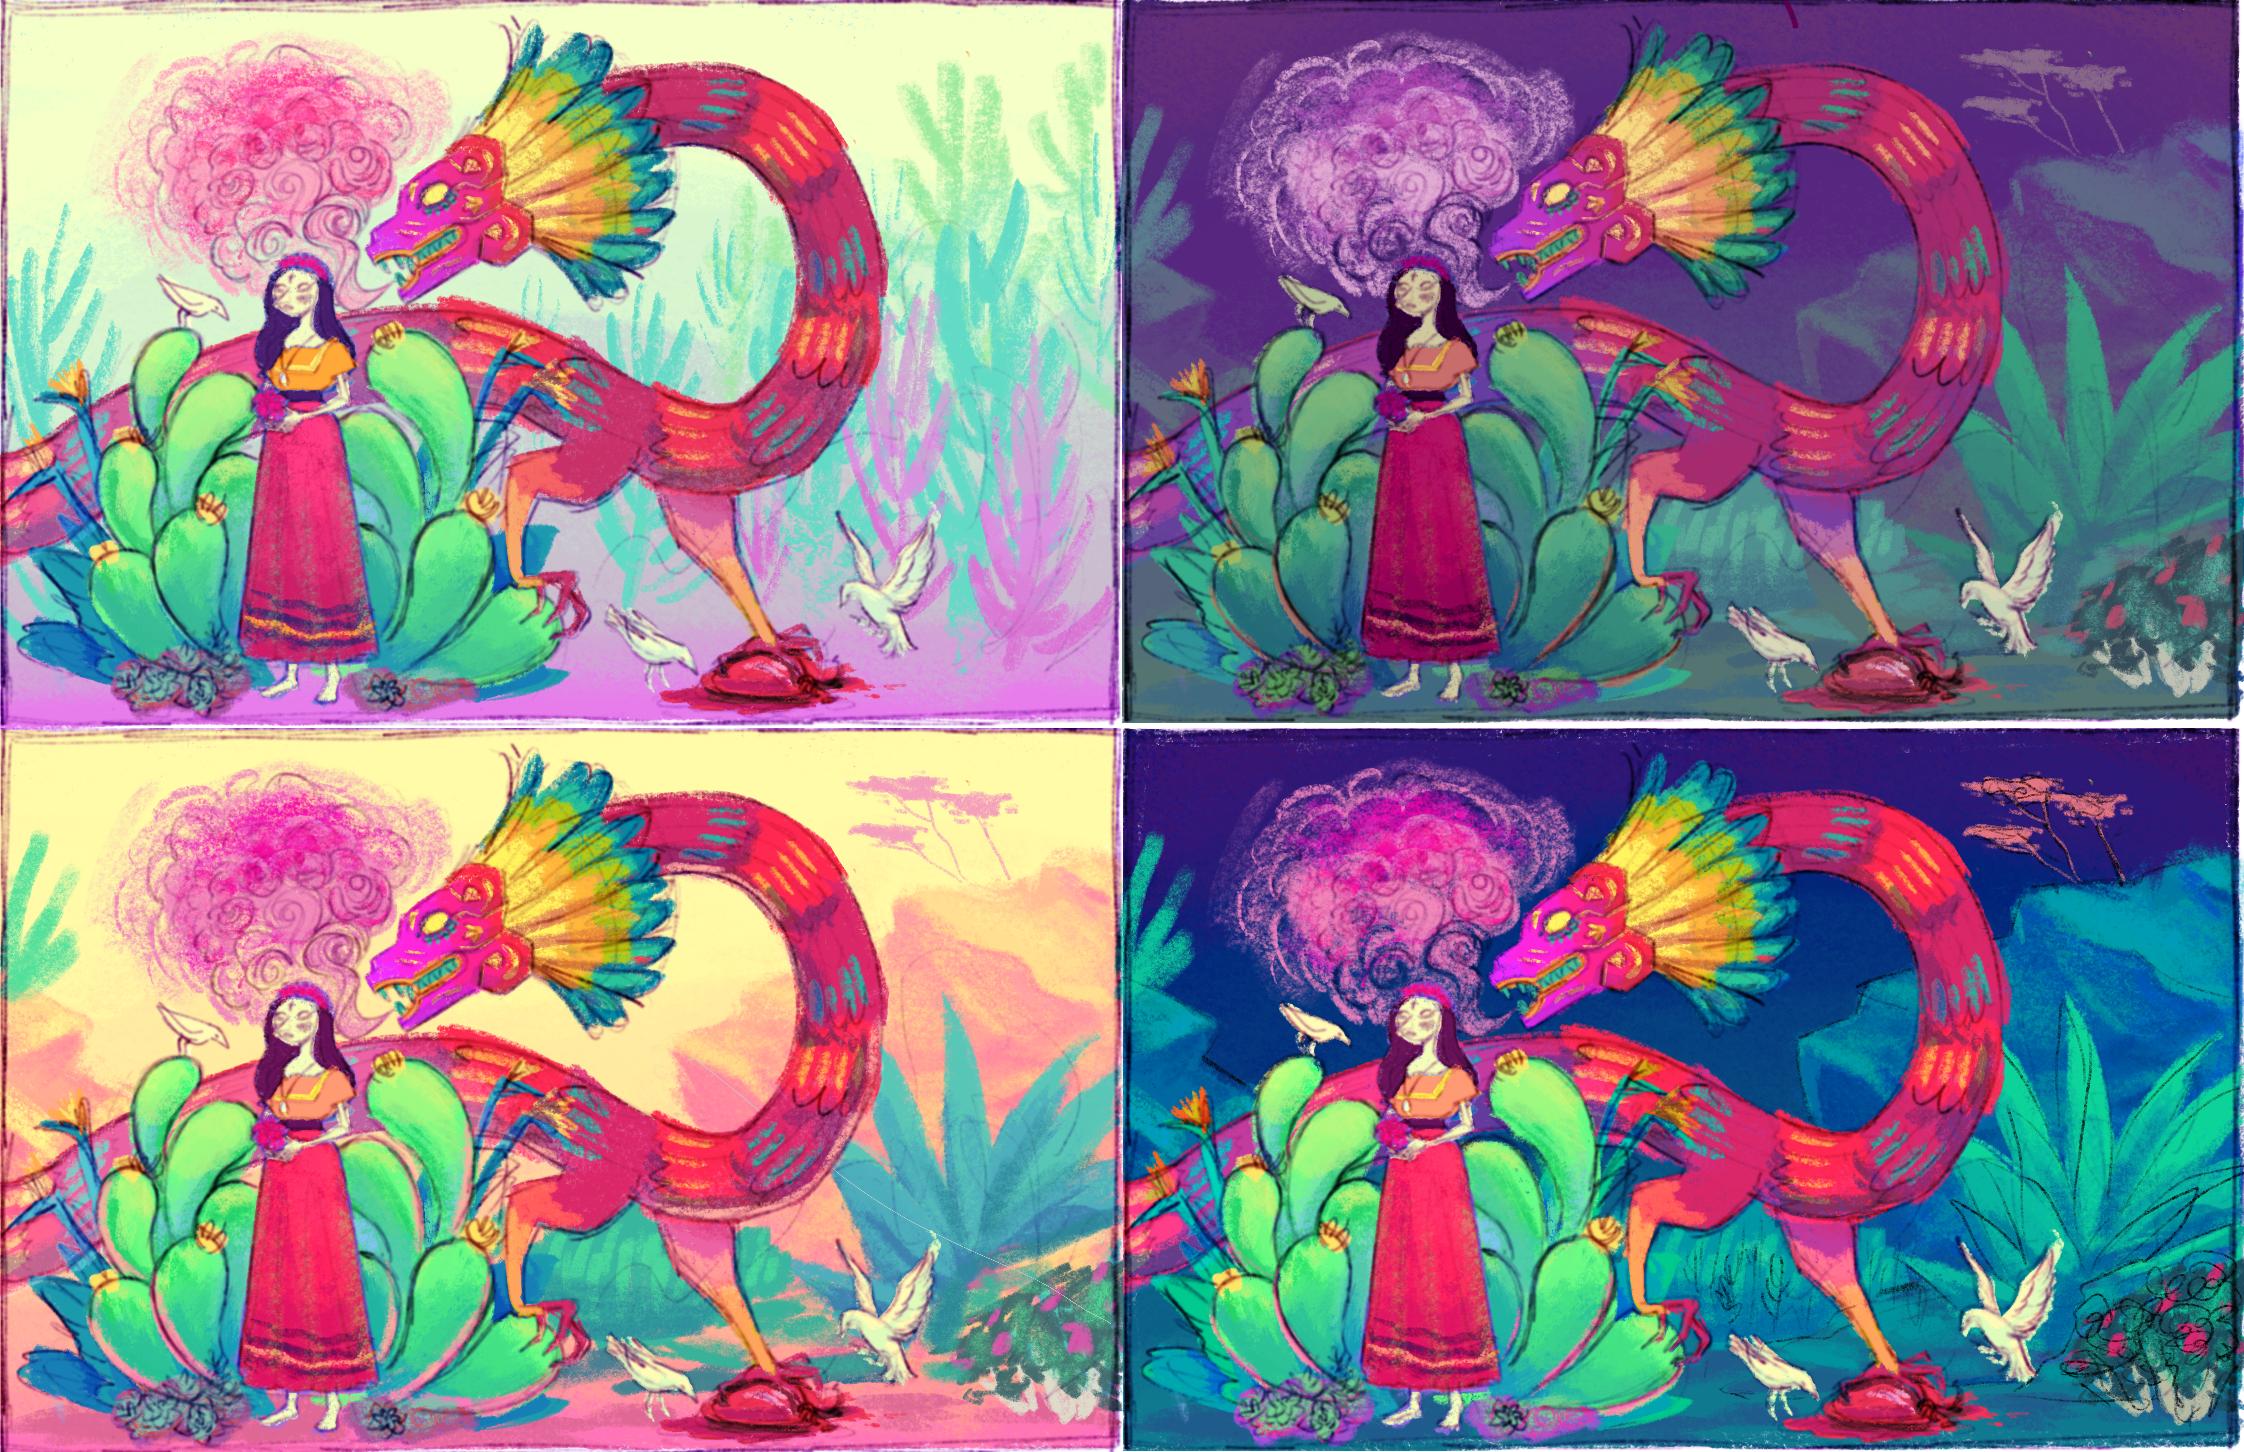 Color tests and background design